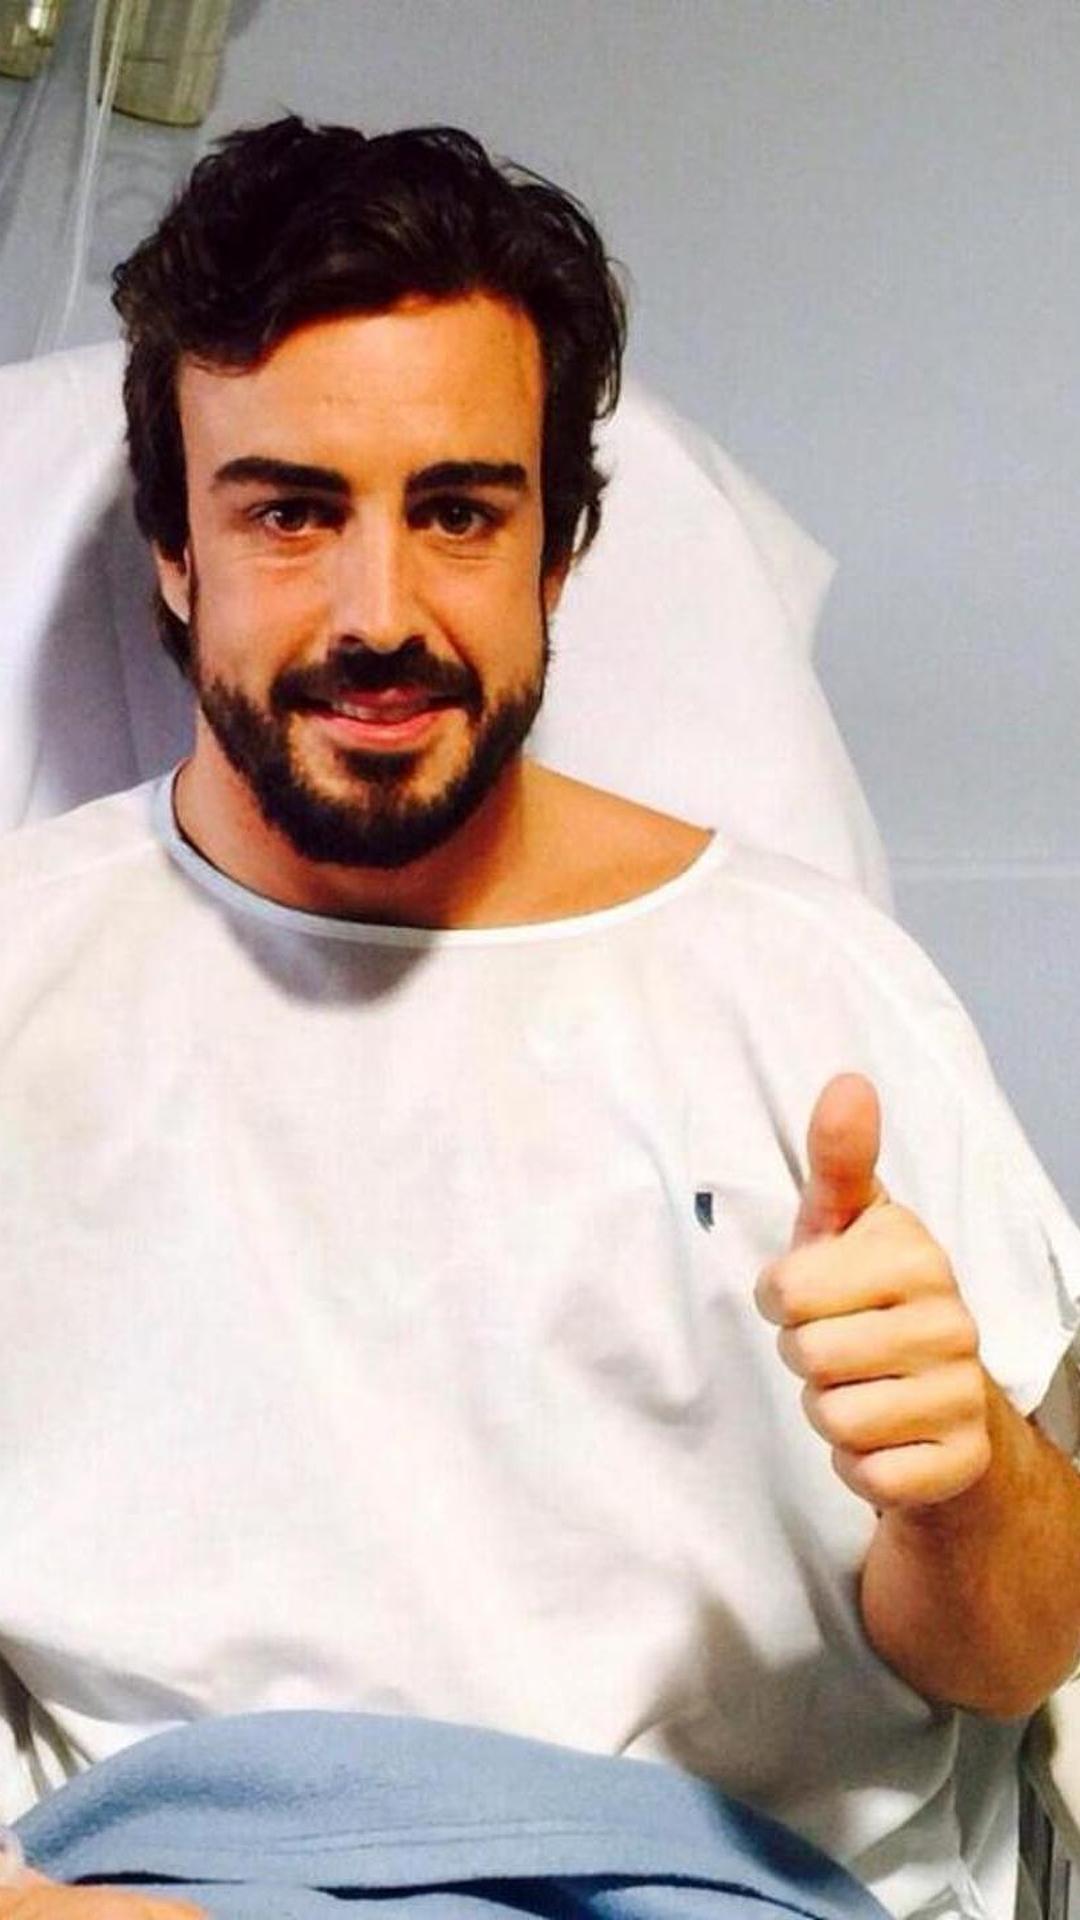 Alonso to reunite with Barcelona hospital team